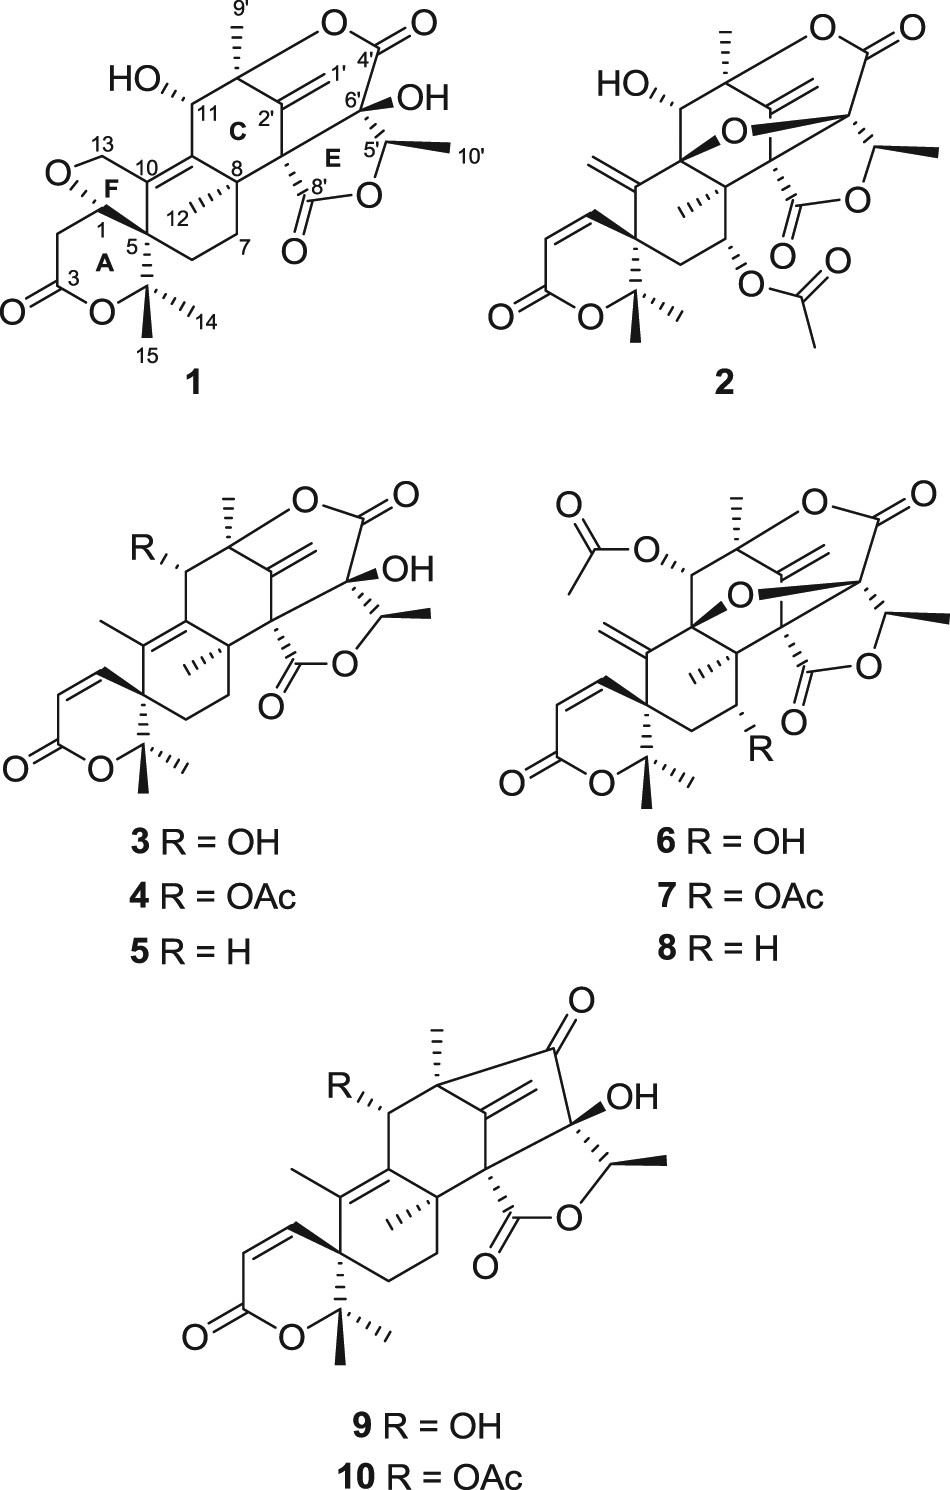 Furanoaustinol And 7 Acetoxydehydroaustinol New Meroterpenoids From Potato Gun Diagram A Marine Derived Fungal Strain Penicillium Sp Sf 5497 The Journal Of Antibiotics